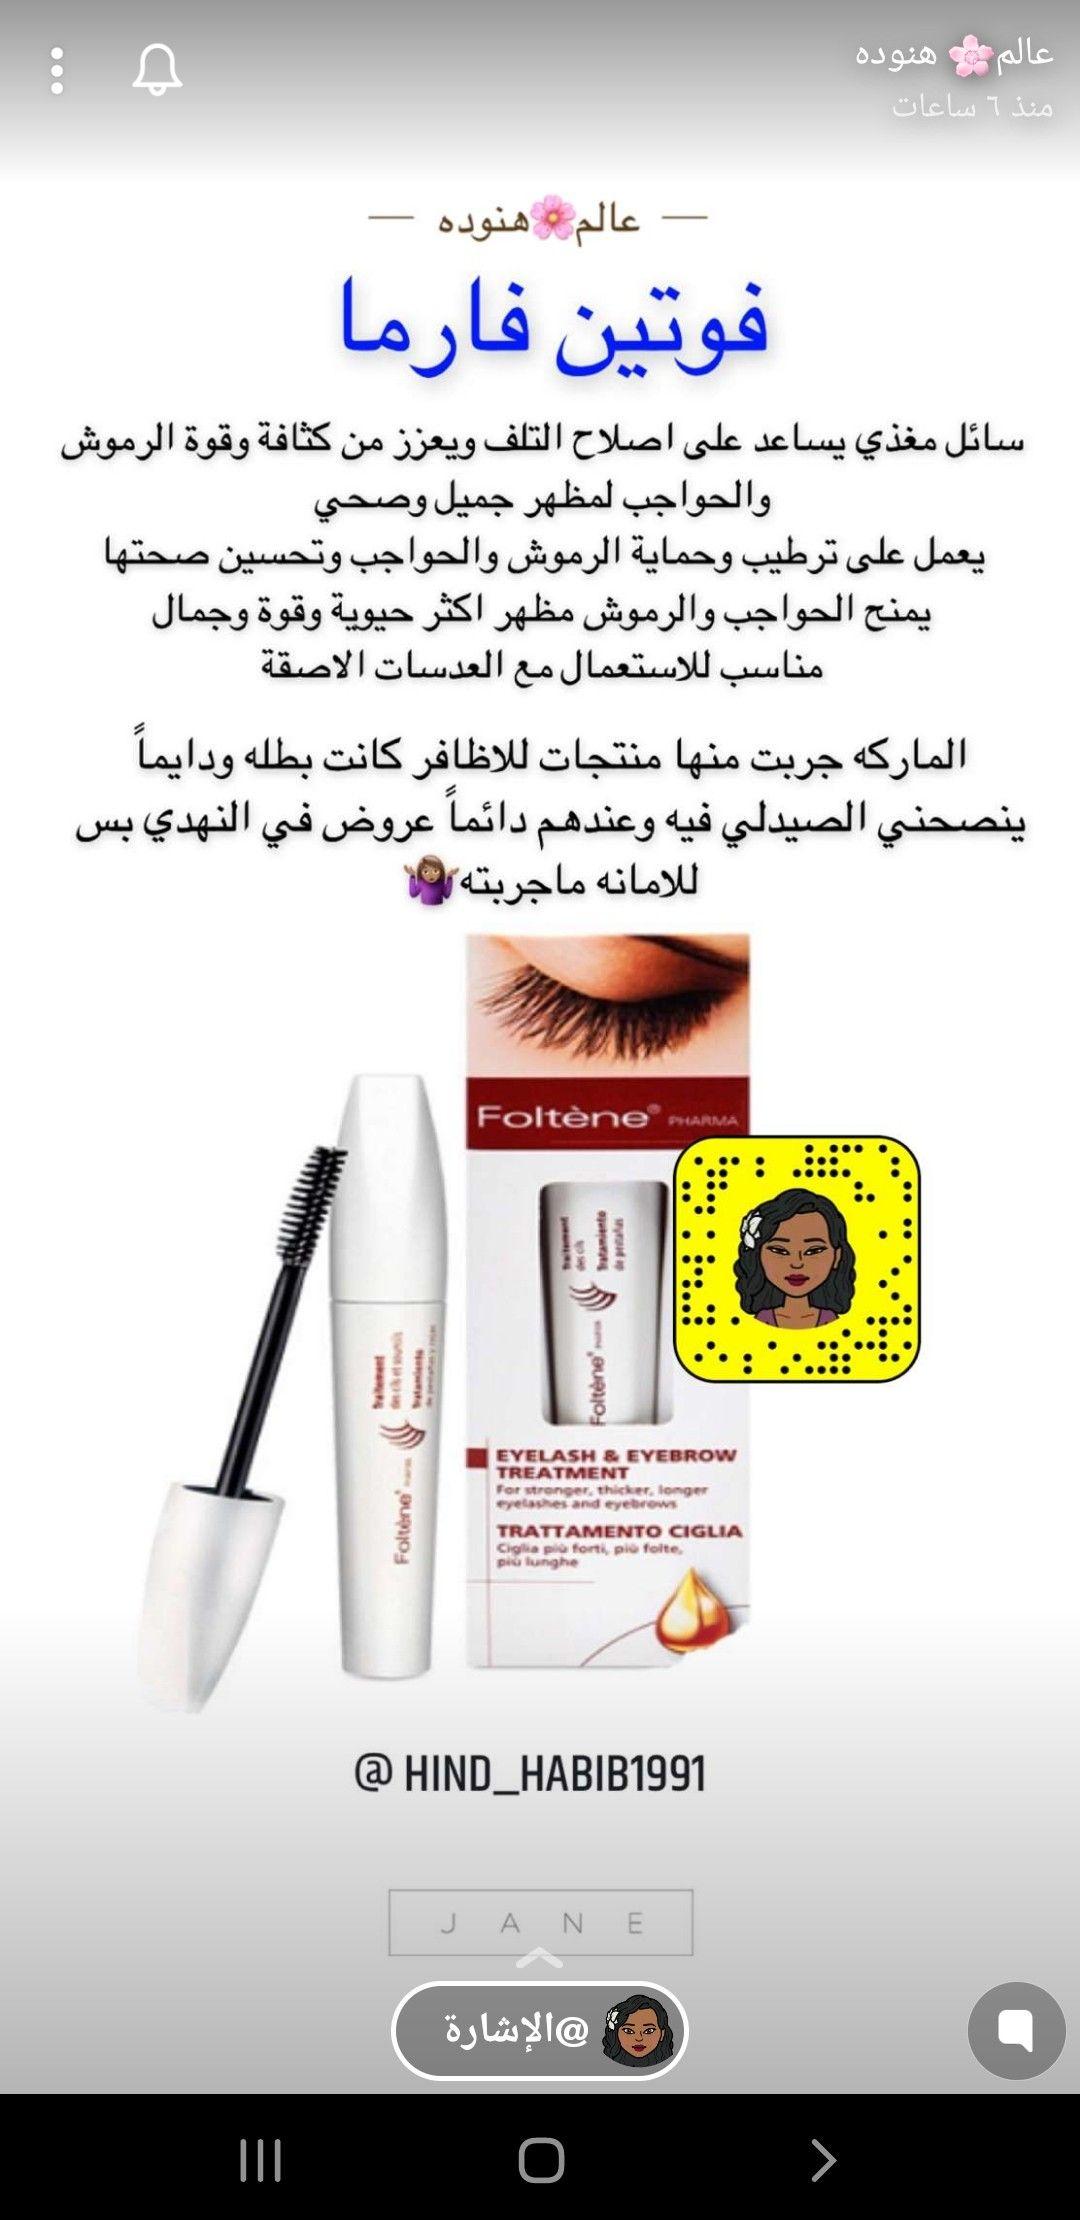 Pin By Shahd On منتجات للبشرة والشعر Eyebrows Shopping